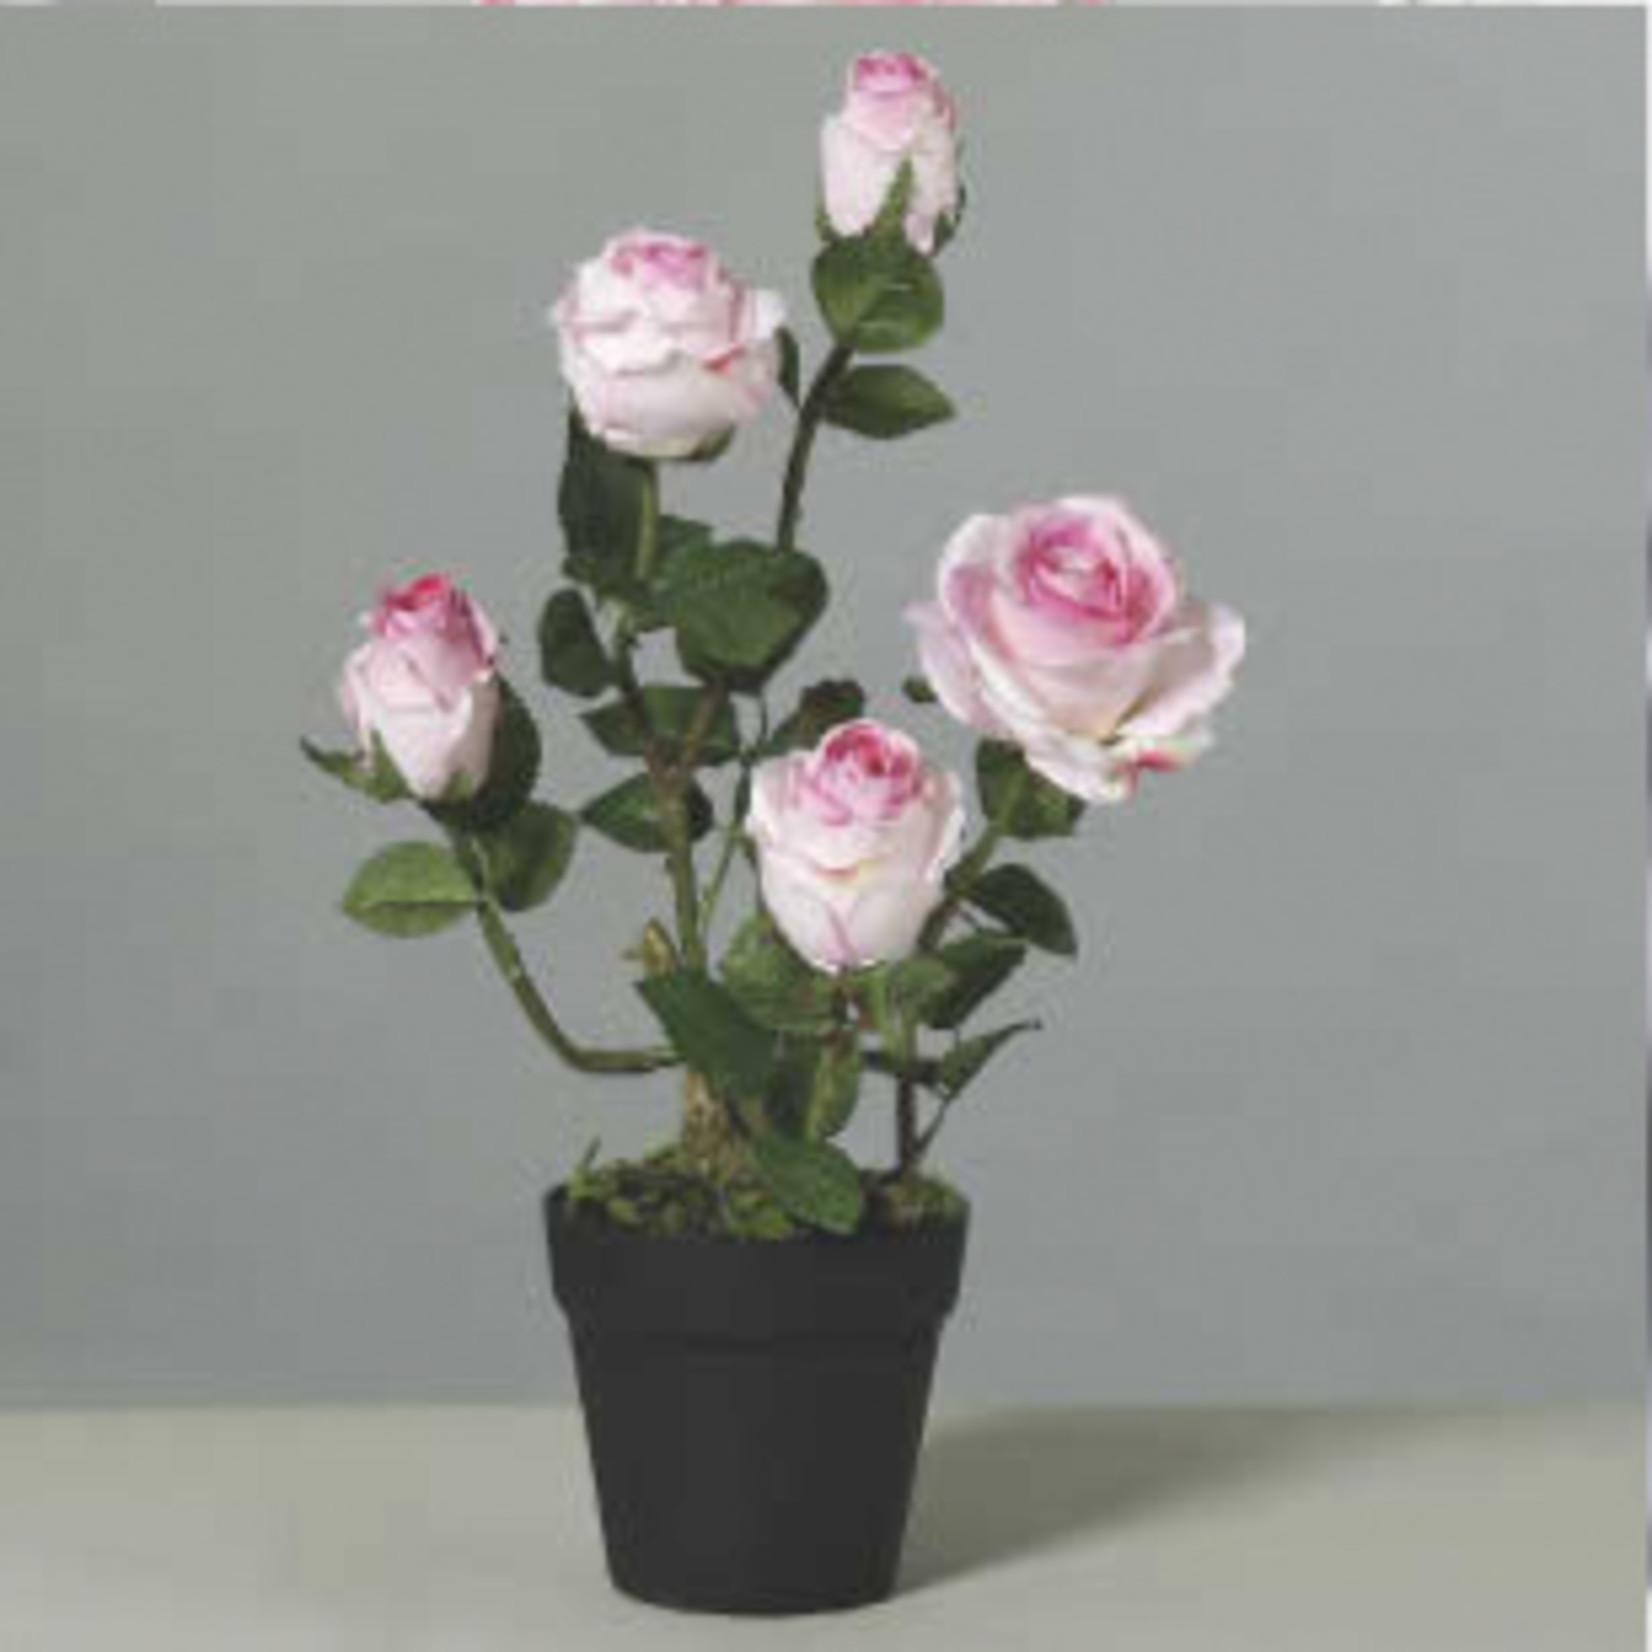 Rosenstrauch im Topf